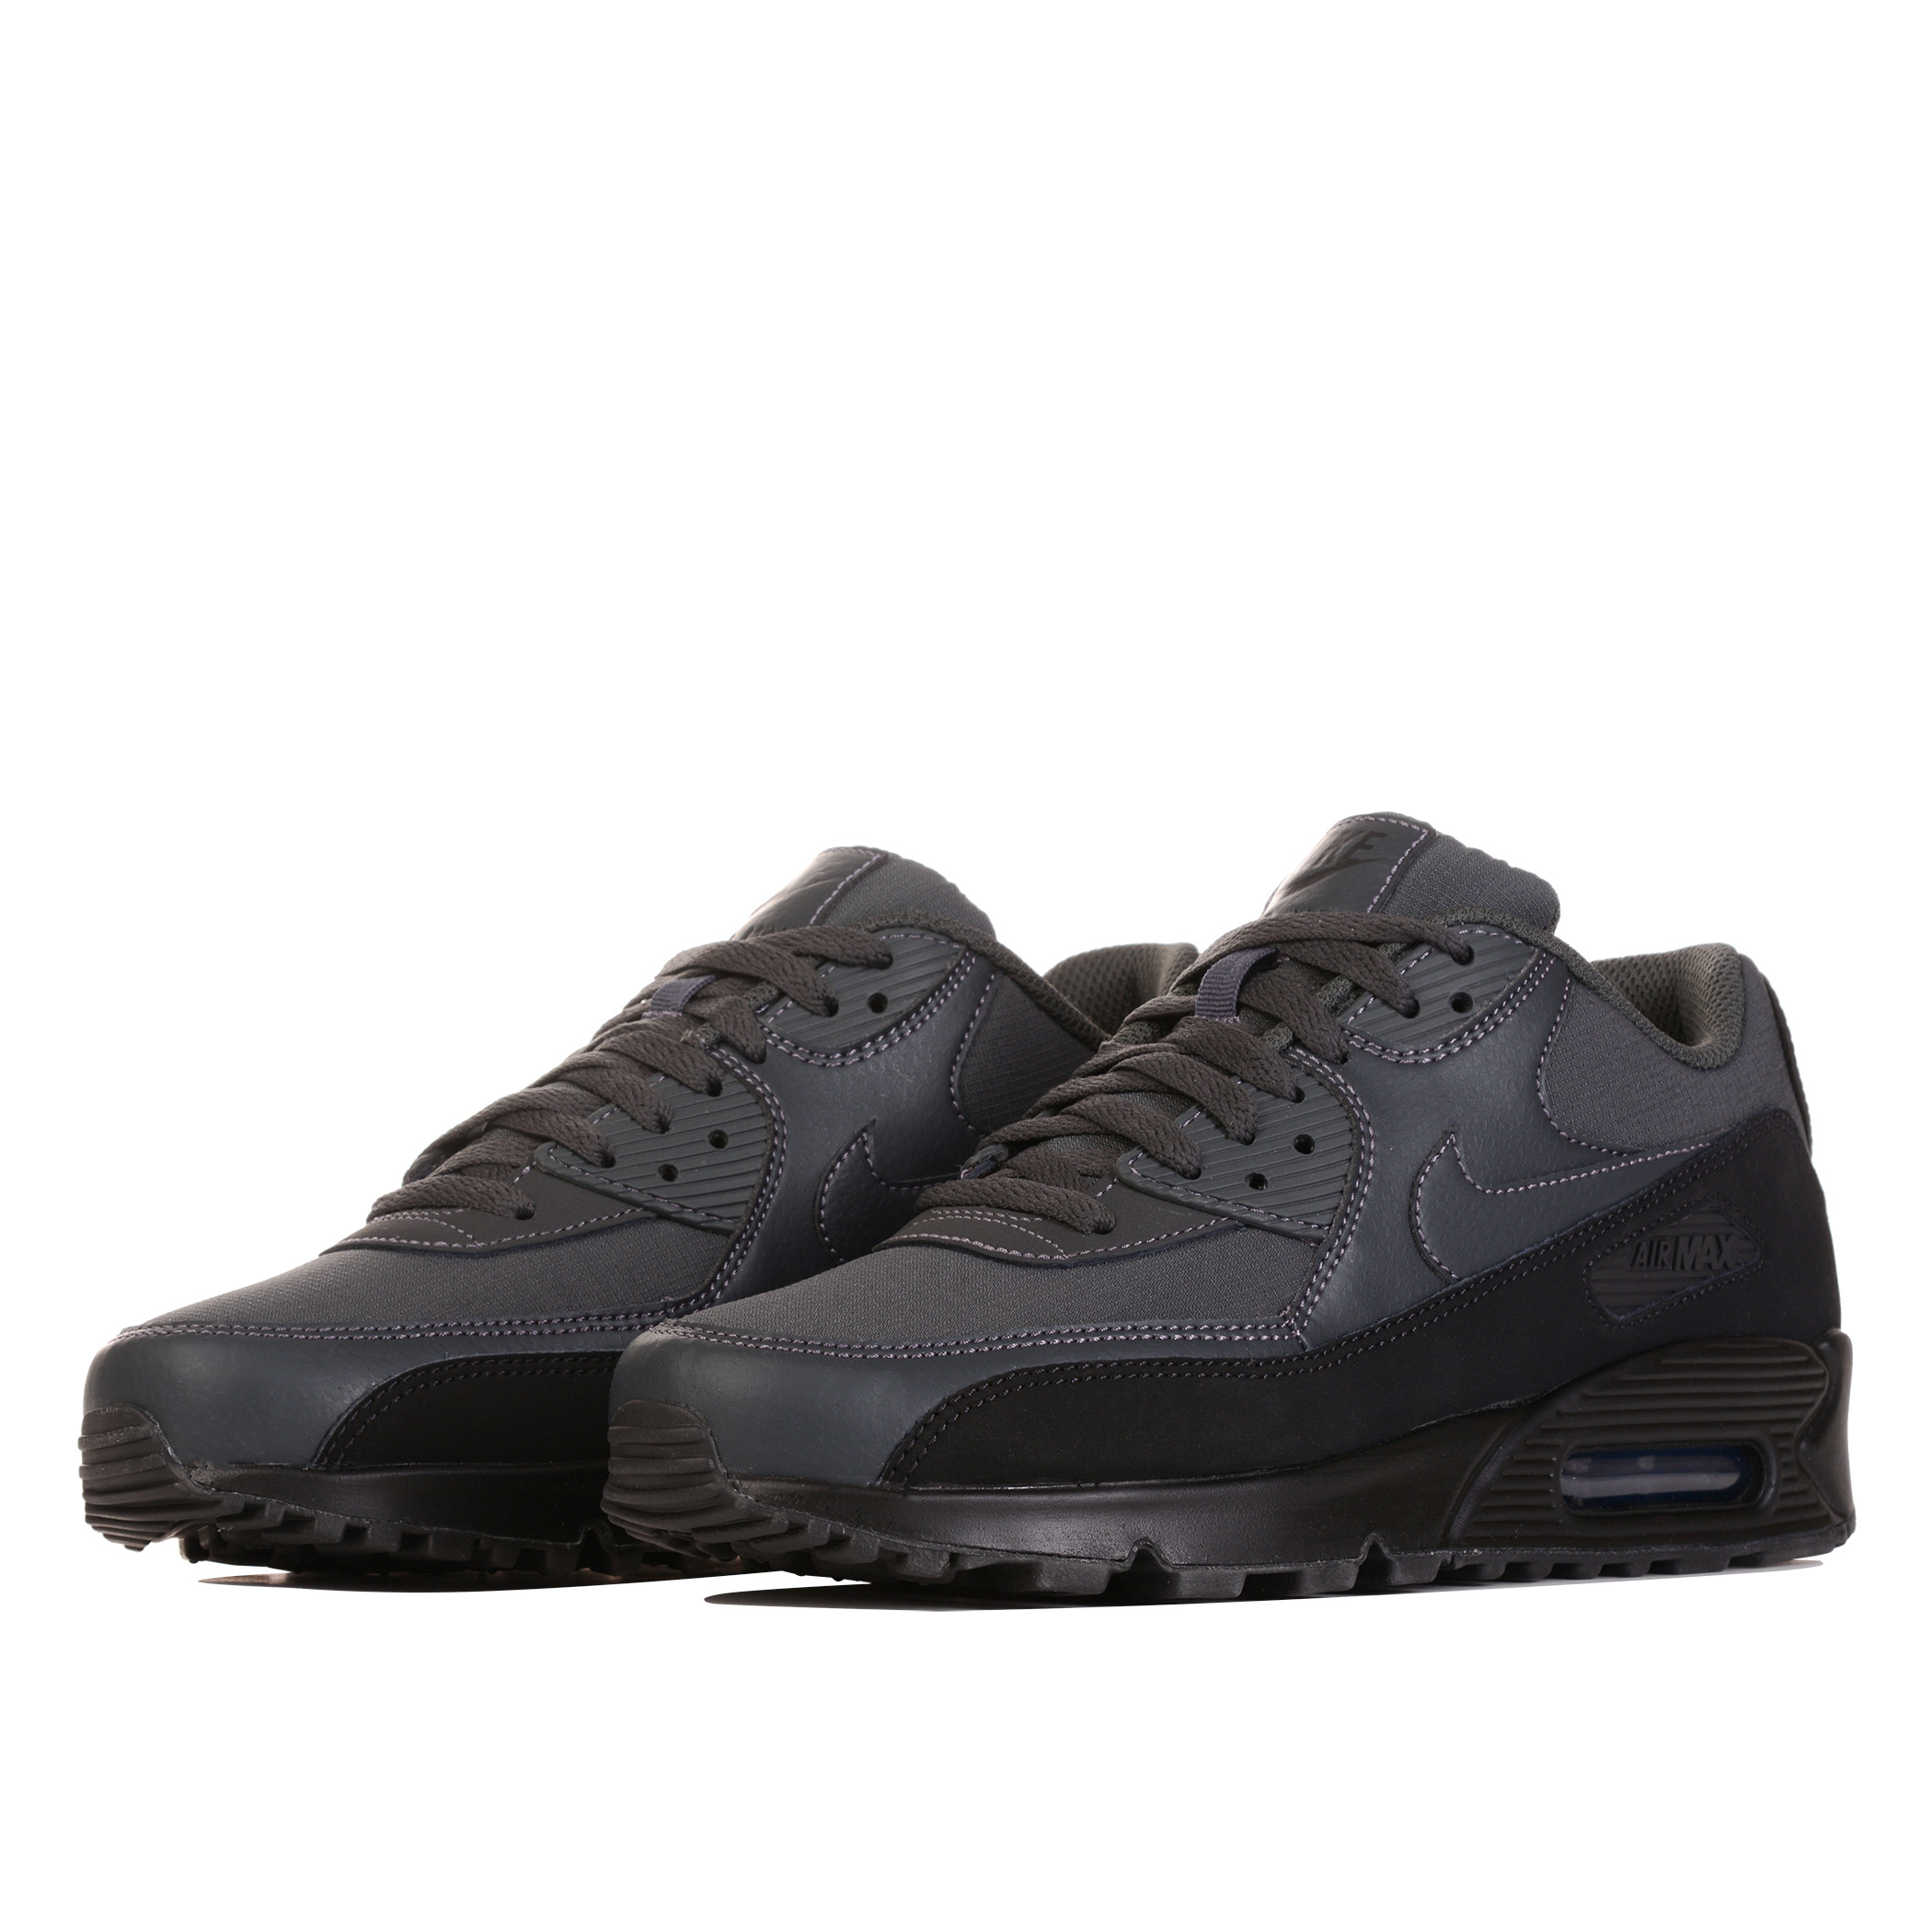 Купить Nike Air Max 90 Ultra SE Night Maroon на из